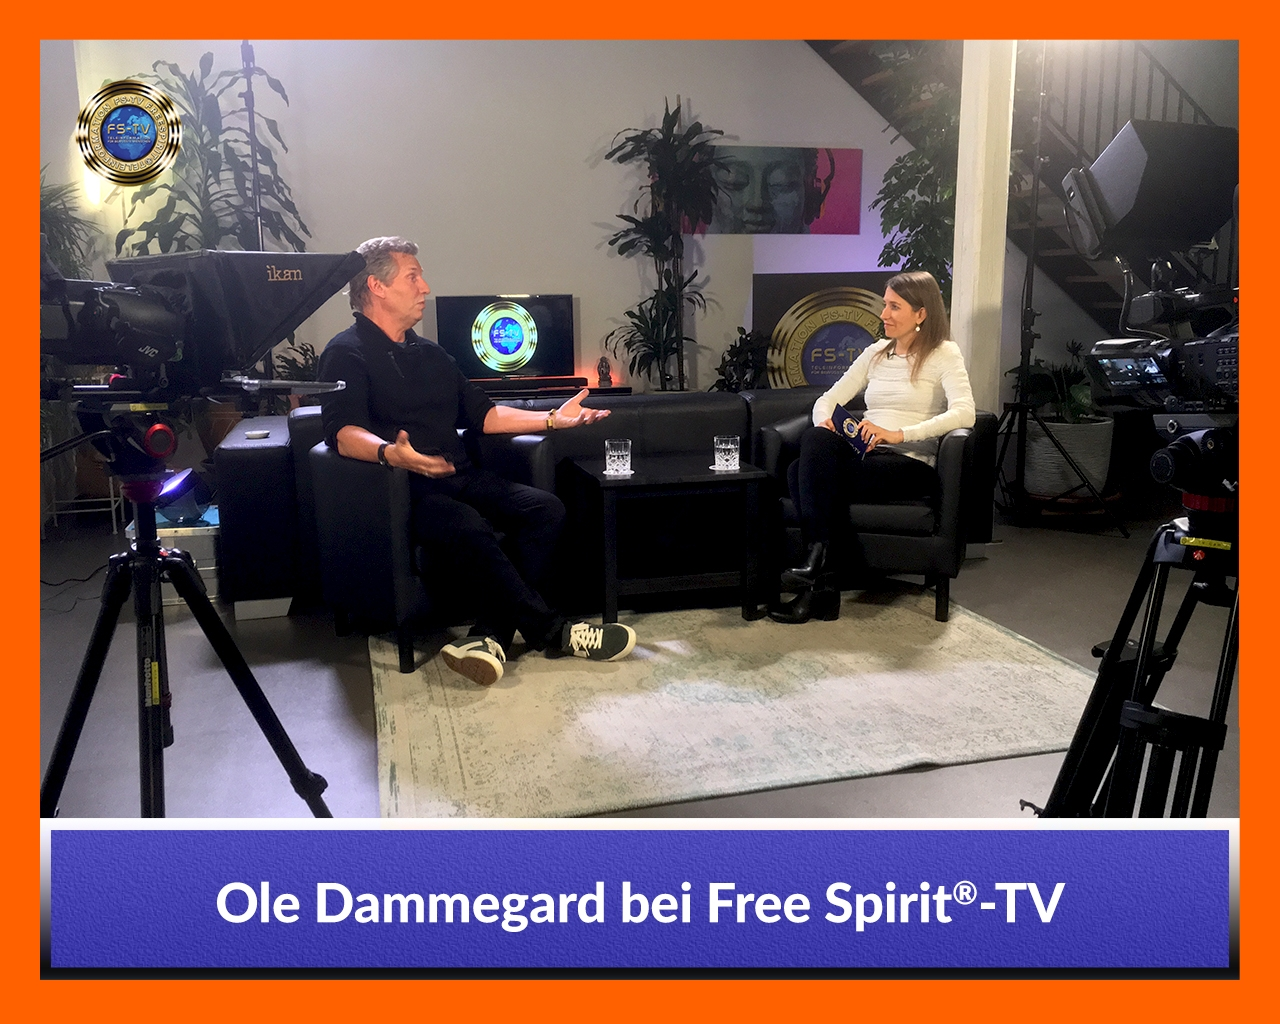 Galleriebild-Ole-Dammegard-9